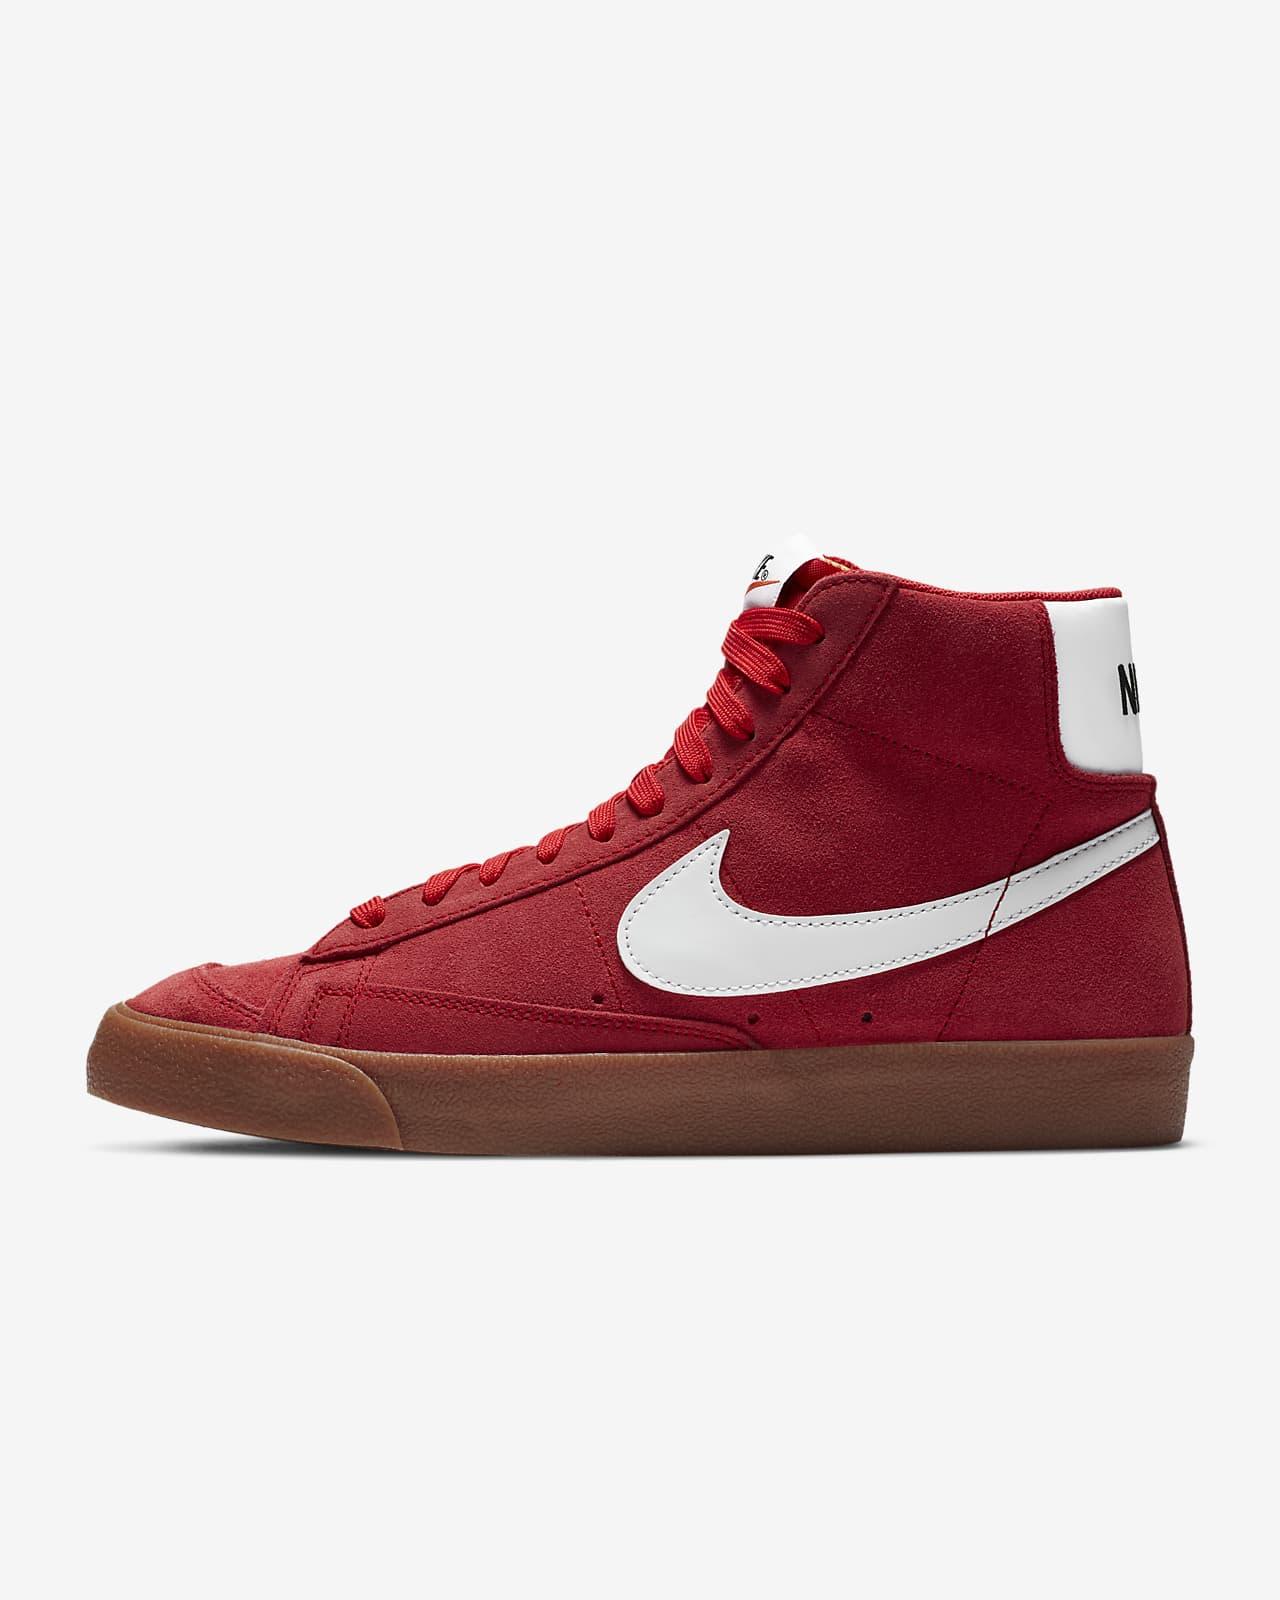 Nike Blazer Mid '77 Suede Shoe